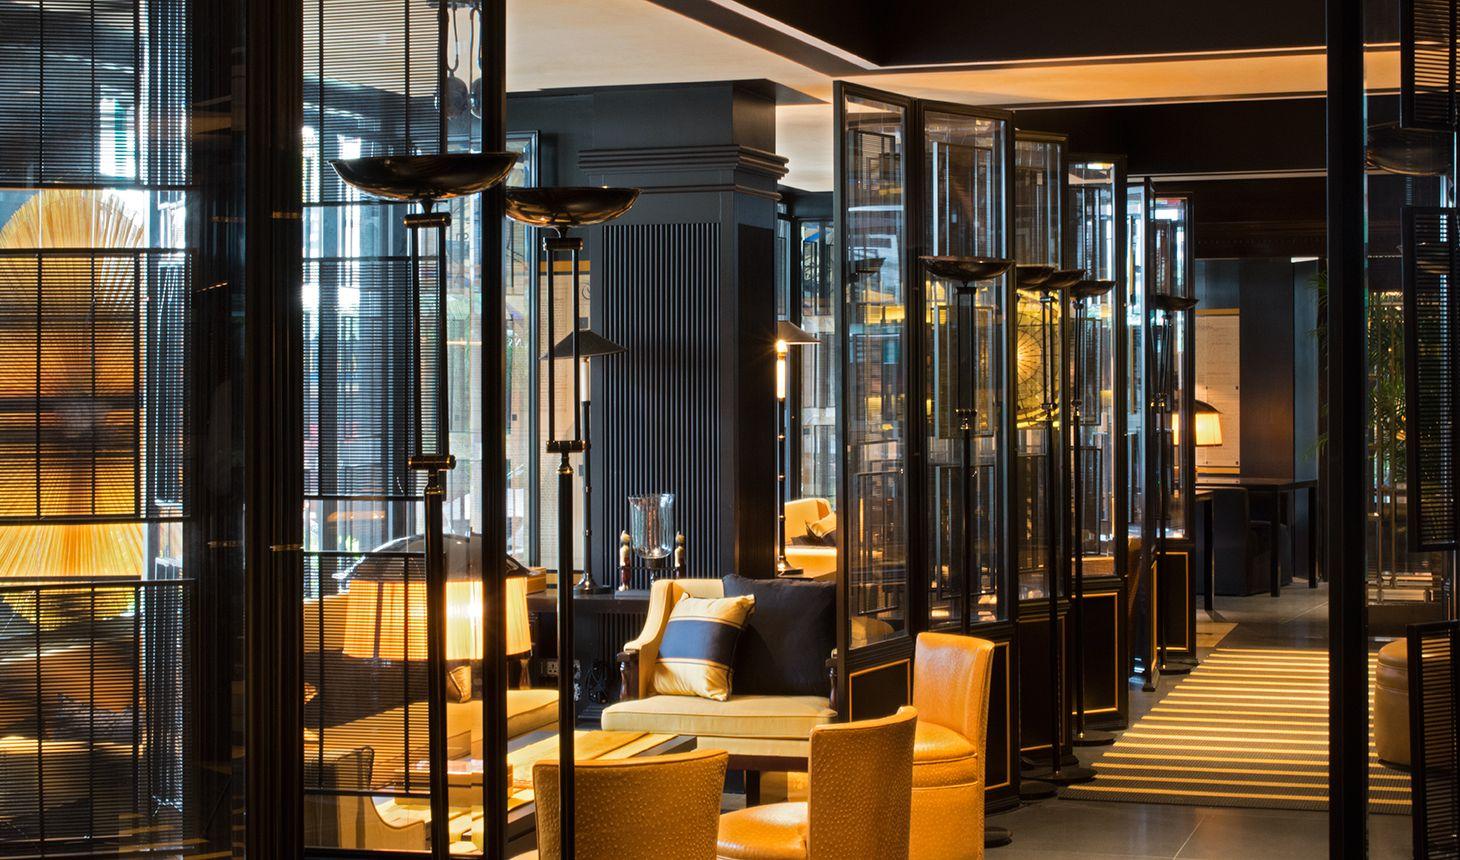 Six Senses Duxton Hotel Singapore Anouska Hempel Zonca Zoncainternational It Hotel Design Interior Design